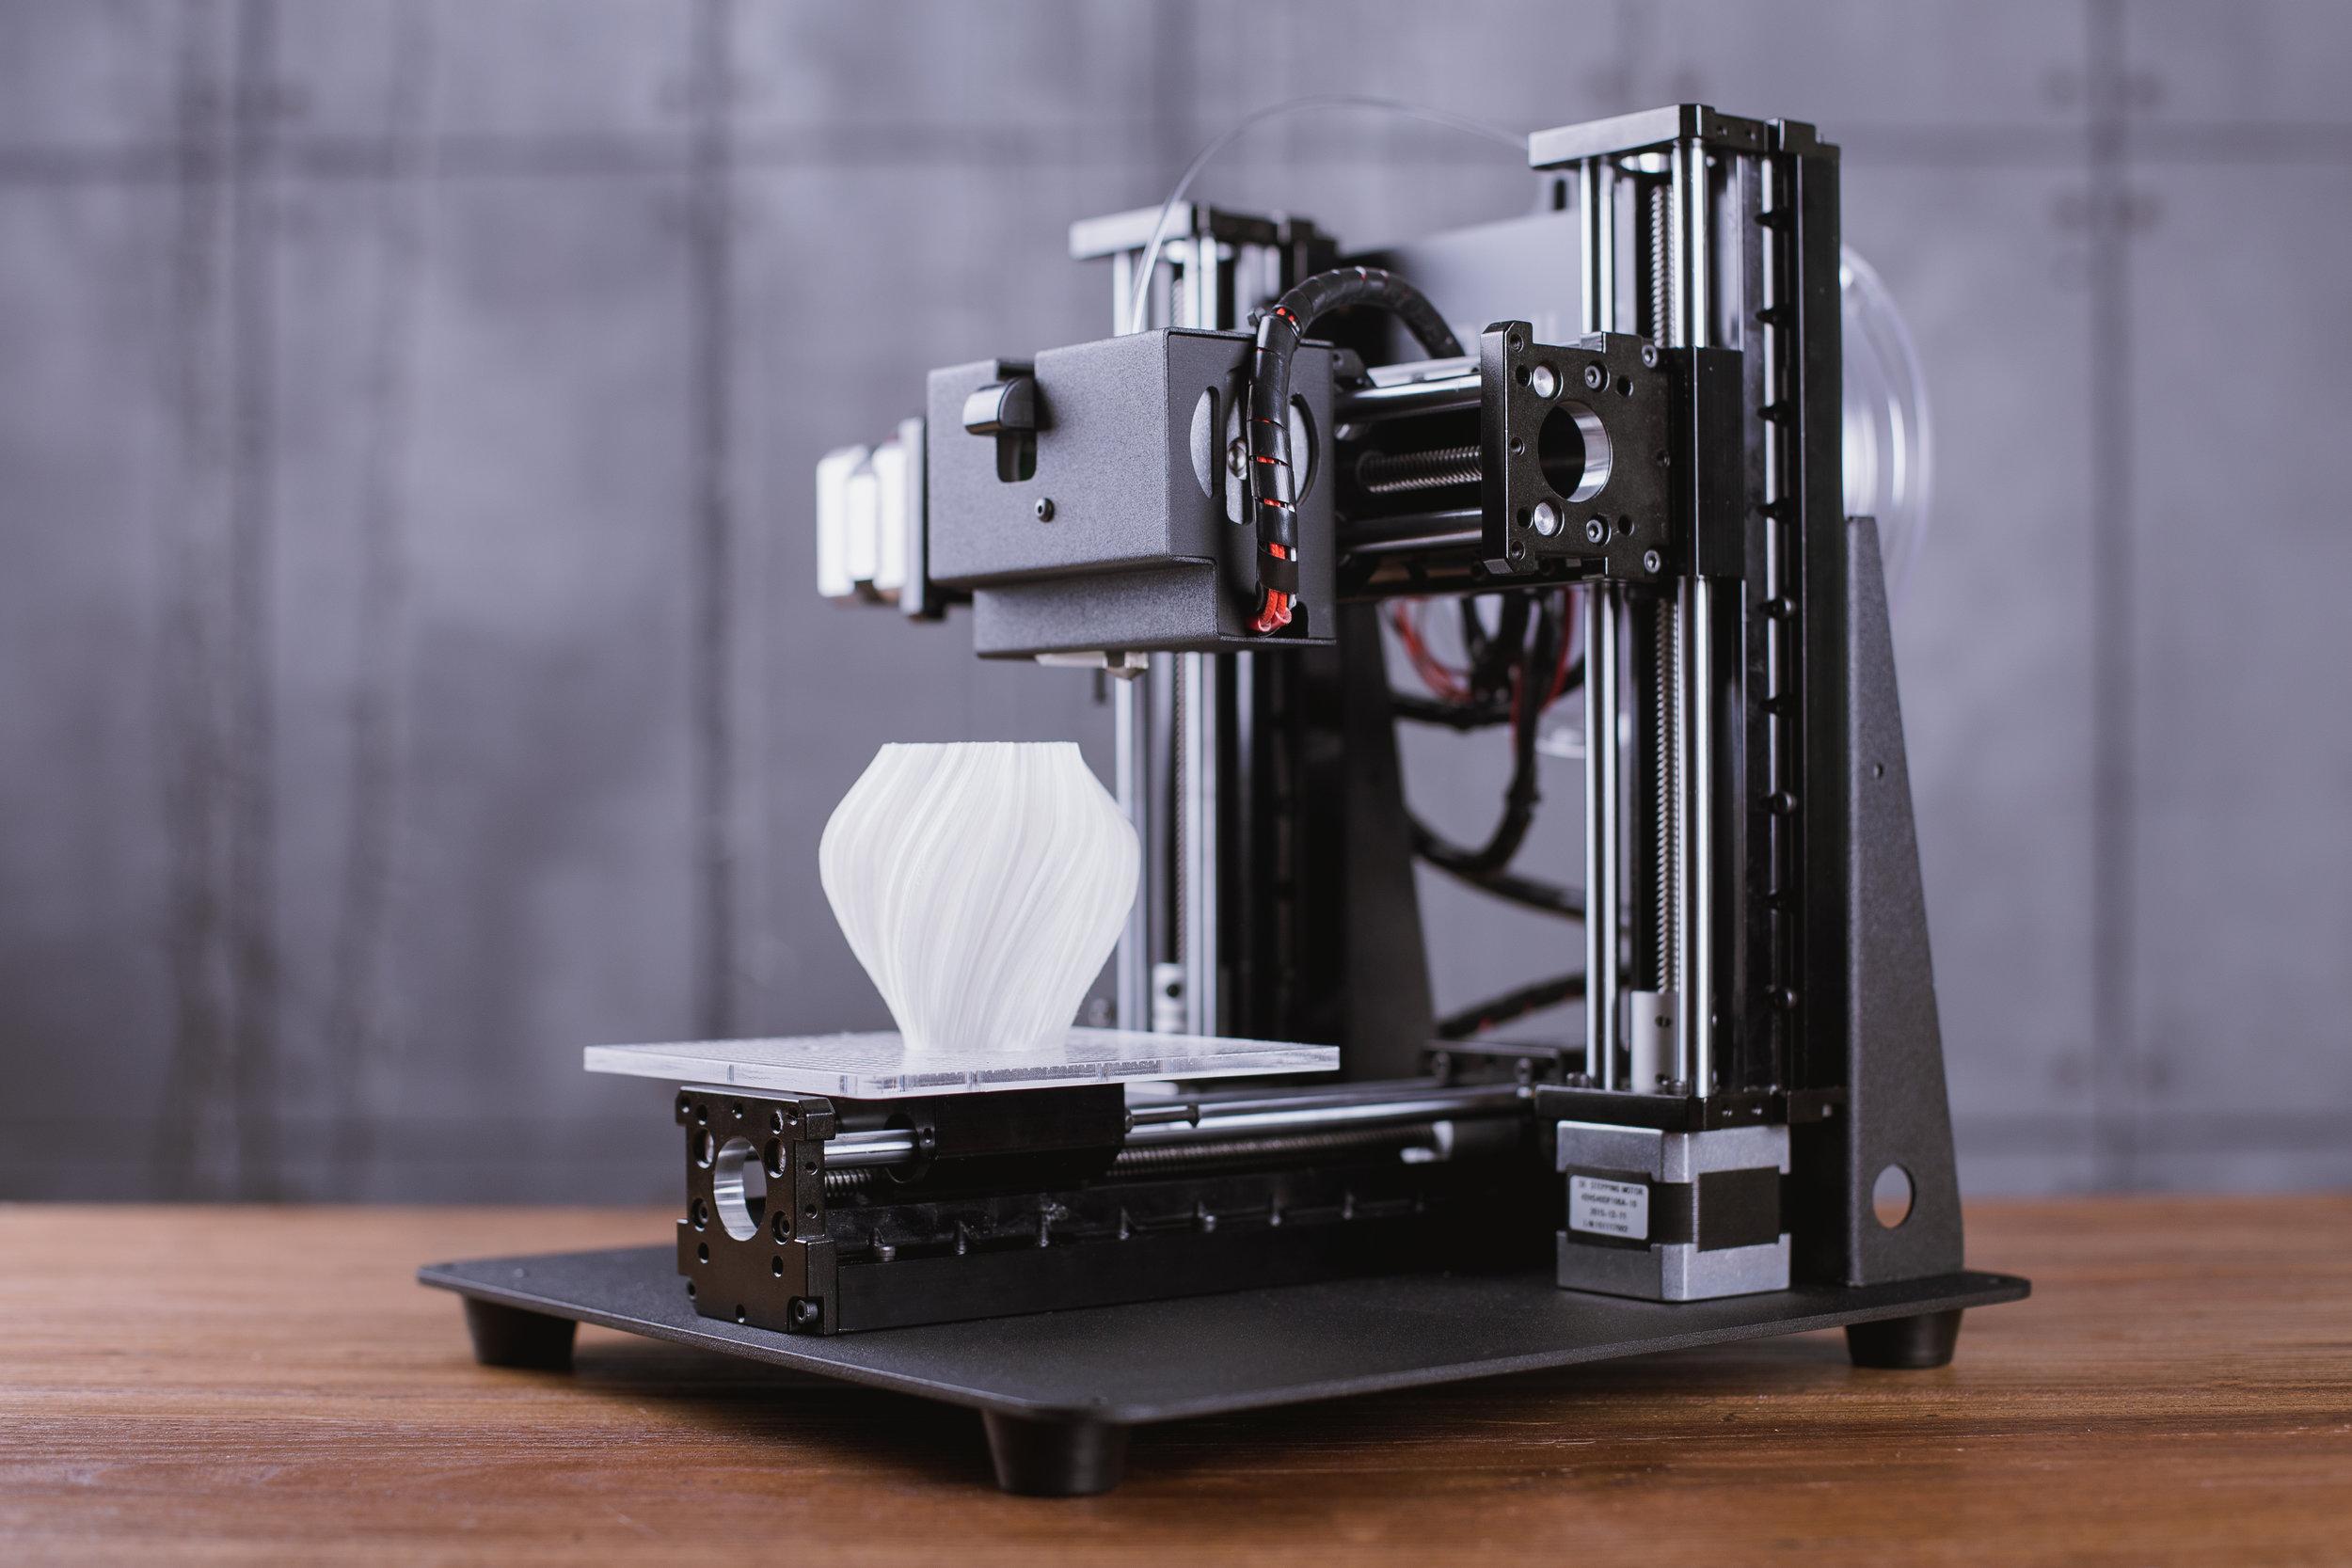 Trinus 3D Printer - Funded $1.6mioKICKSTARTER LINK